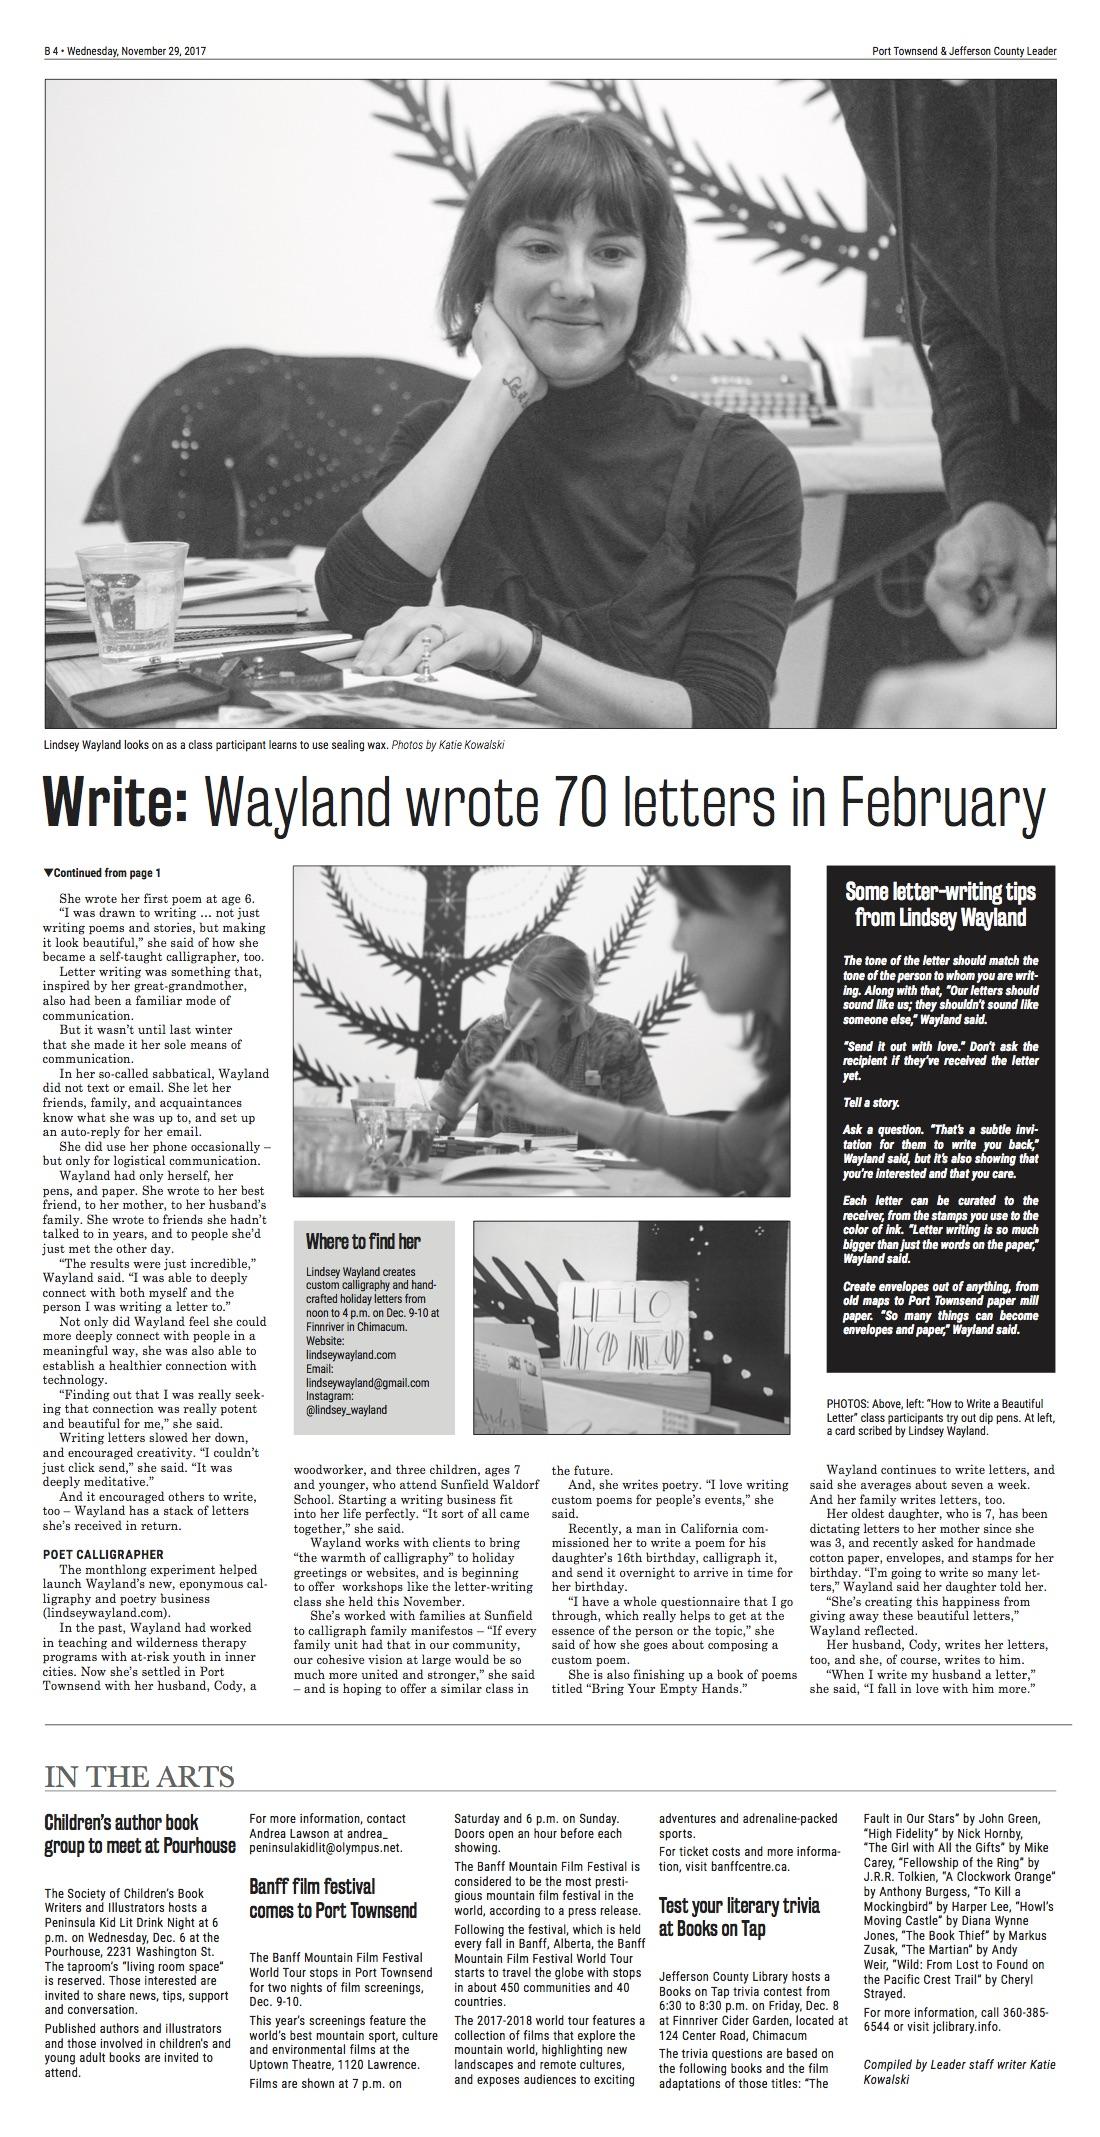 lindsey wayland press 2 11/29/17